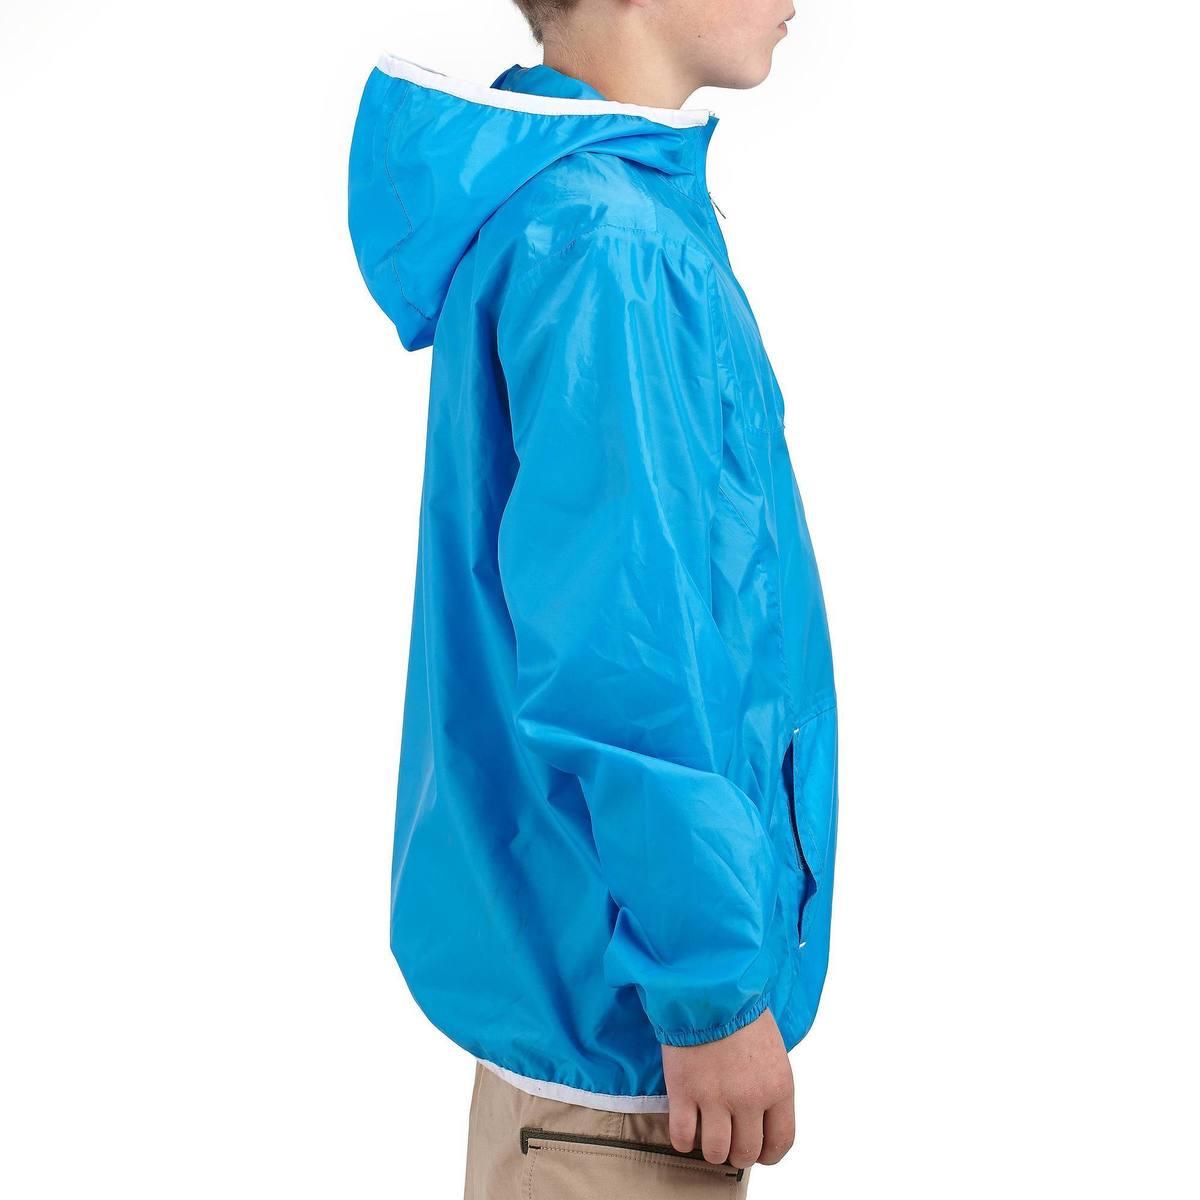 Bild 4 von Wanderjacke Hike 100 Kinder blau